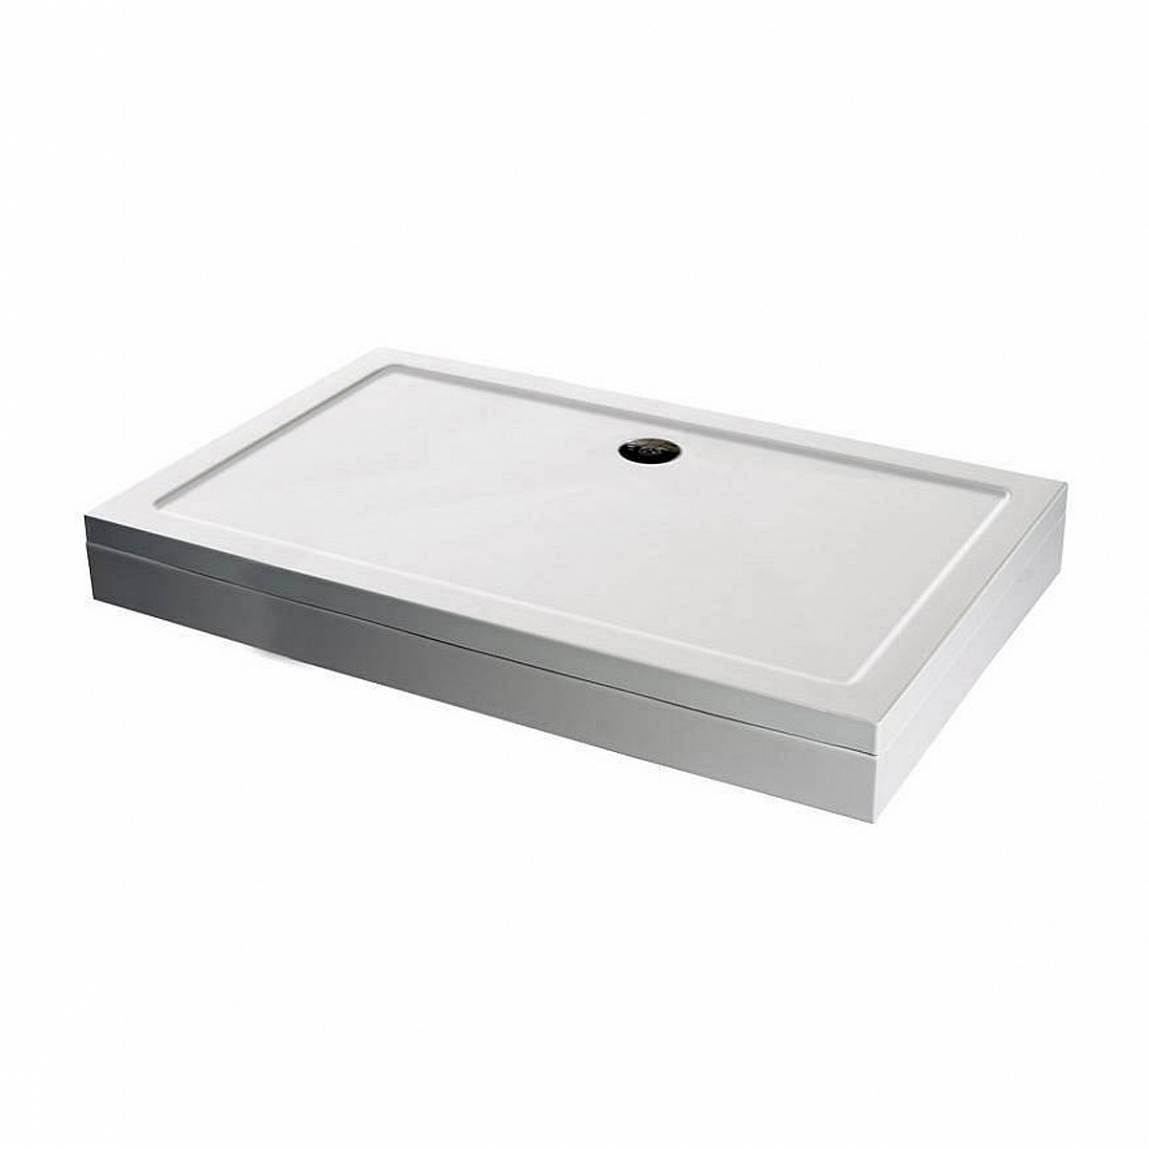 Image of Rectangular Stone Shower Tray & Riser Kit 1400 x 700